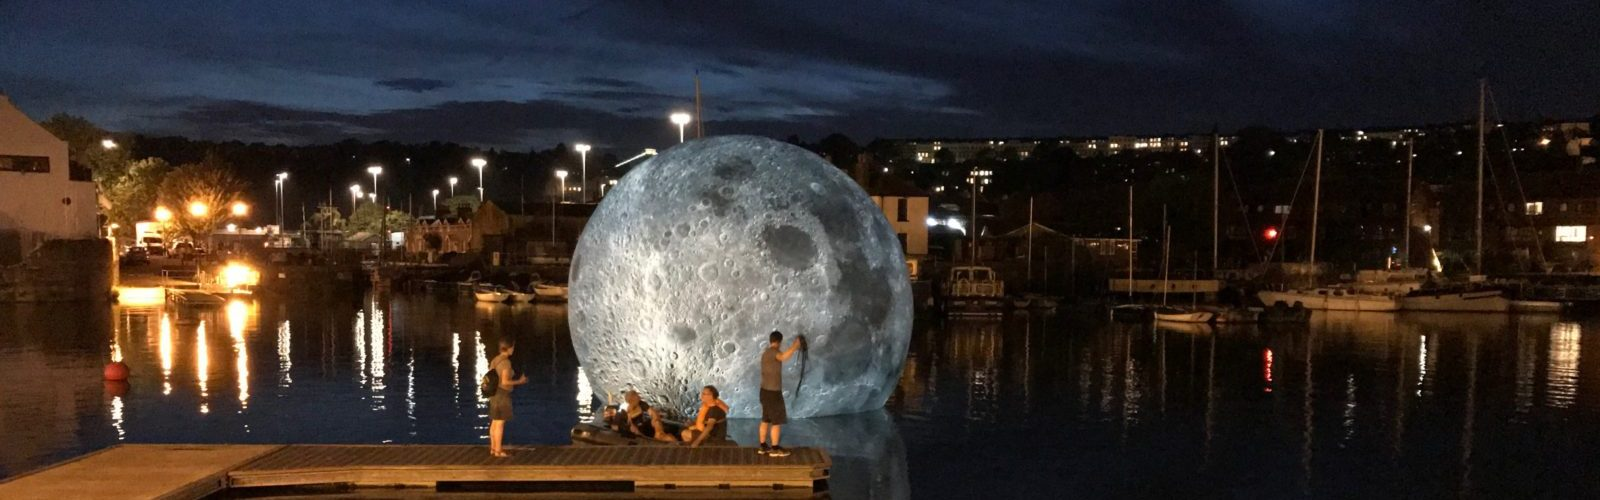 Museum Of The Moon Is A Touring Artwork By UK Artist Luke Jerram.